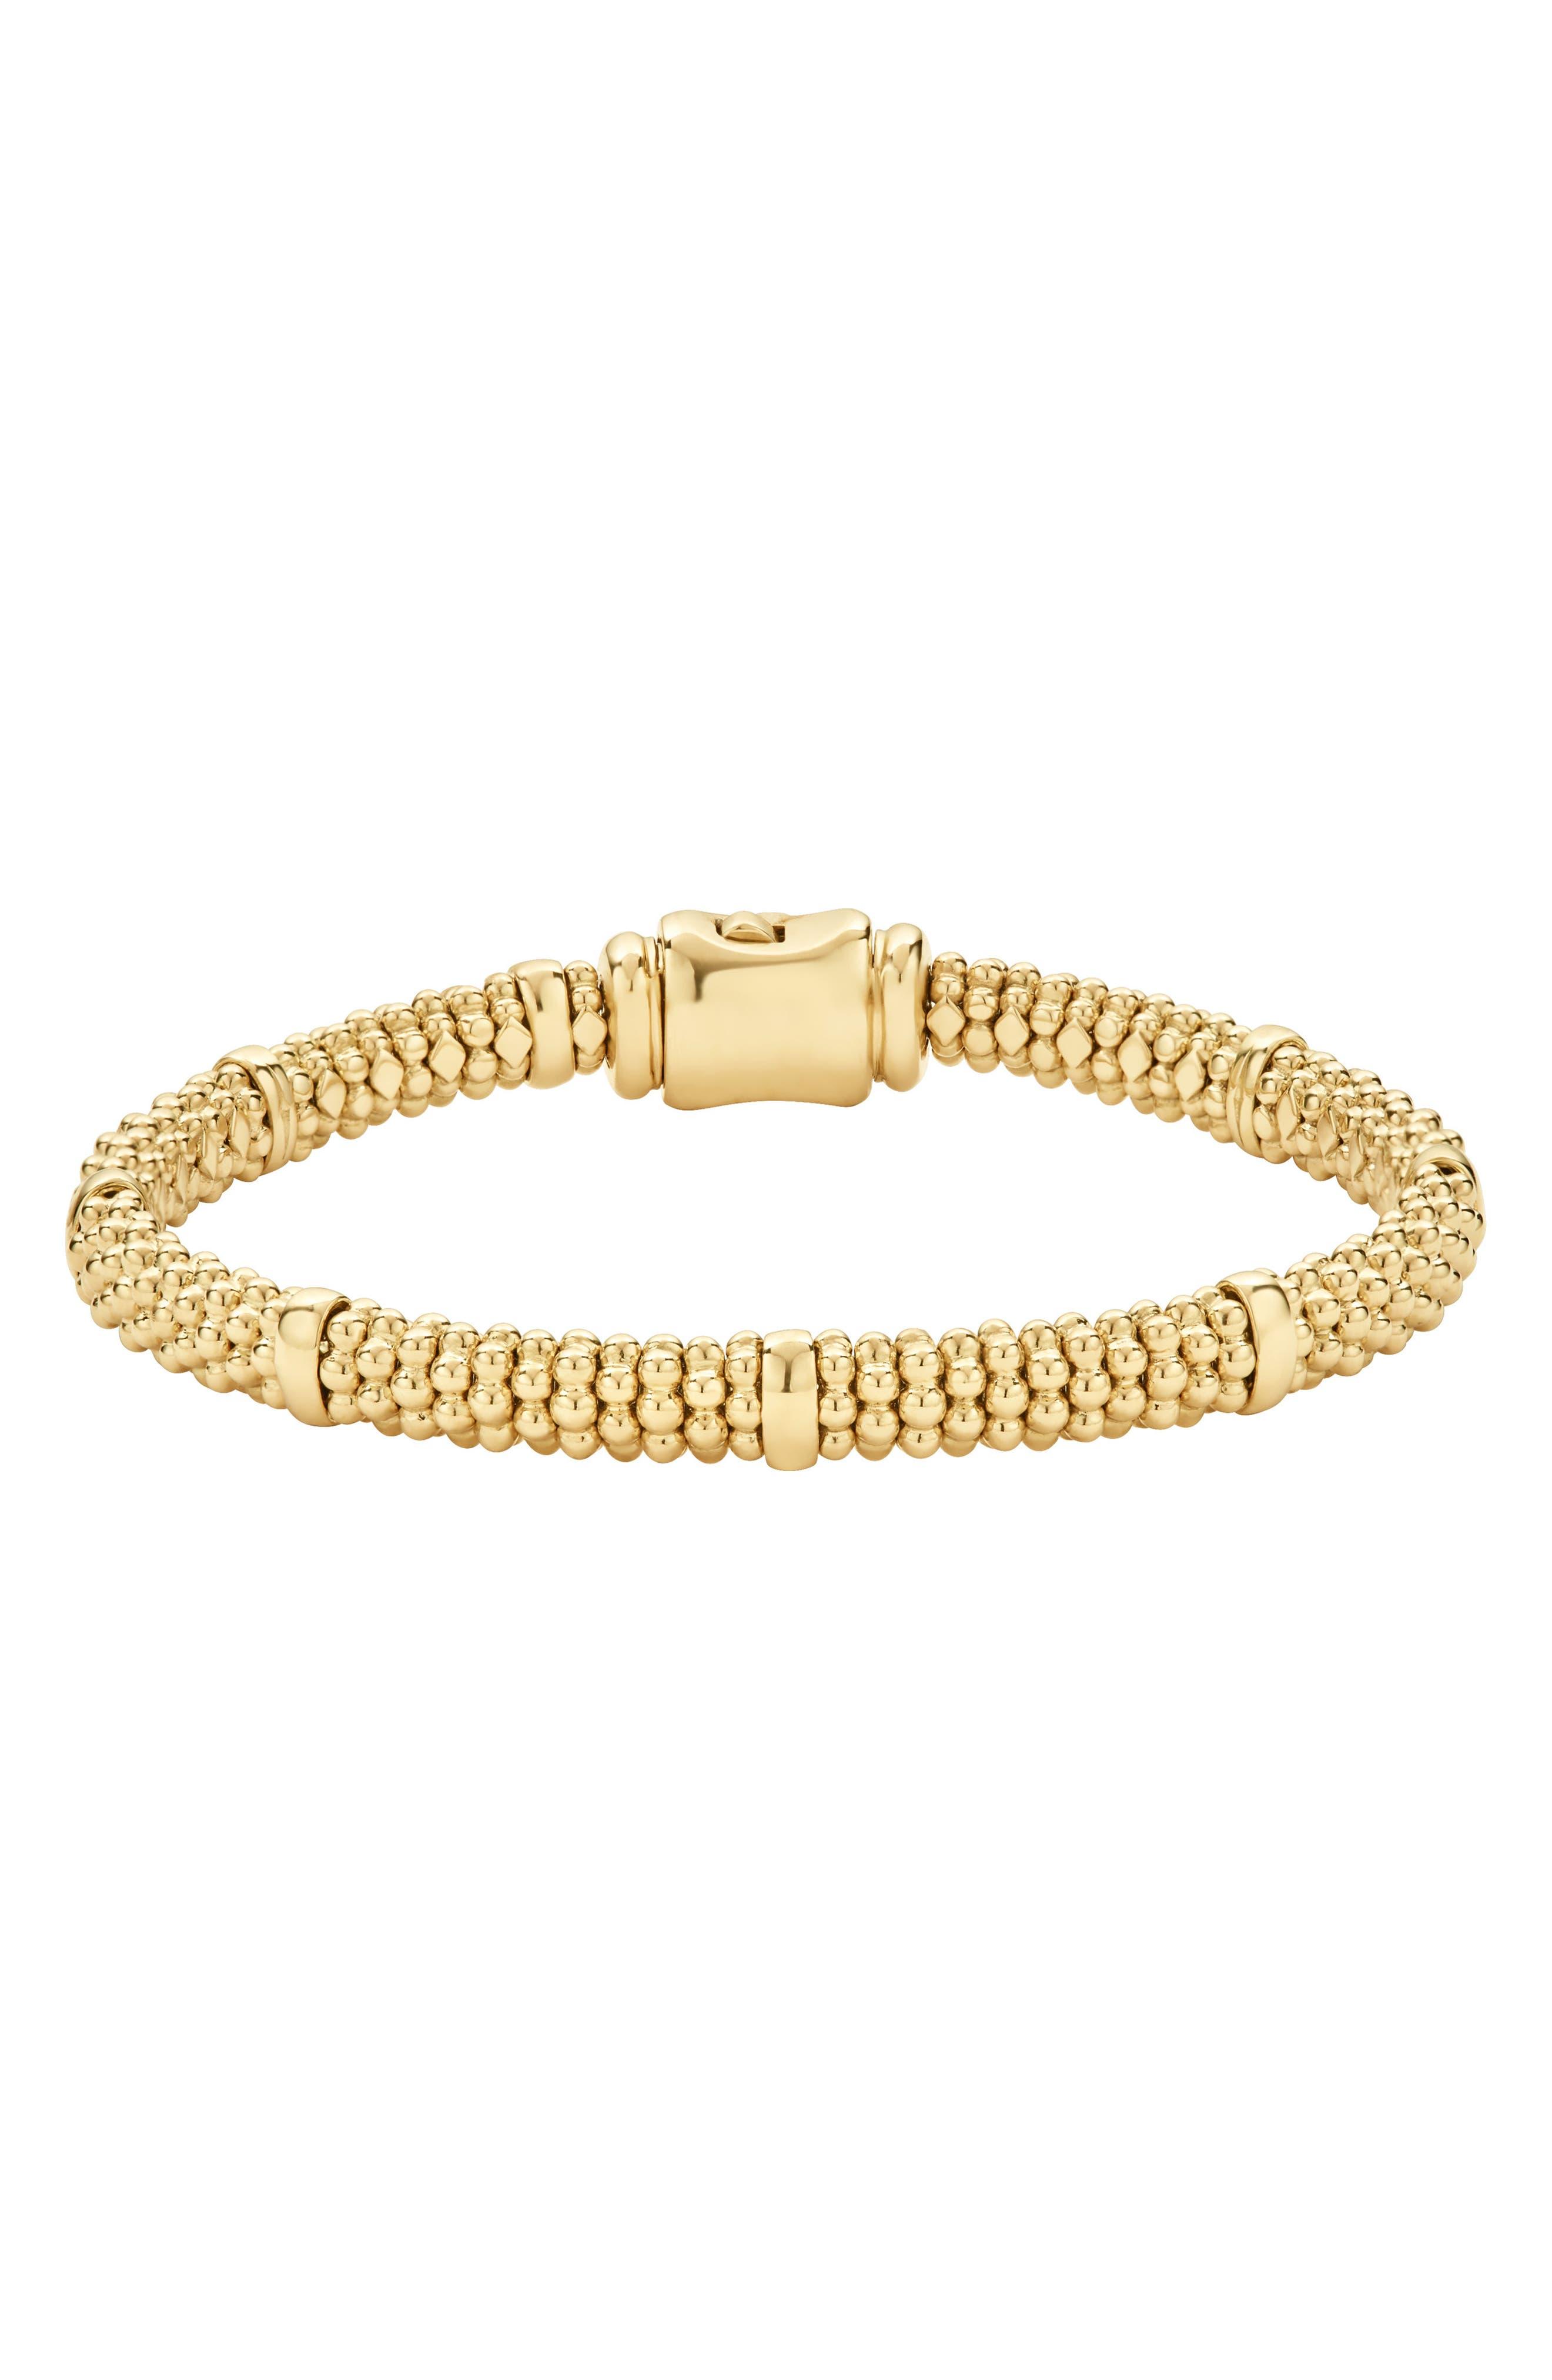 Caviar Rope Bracelet,                         Main,                         color, GOLD